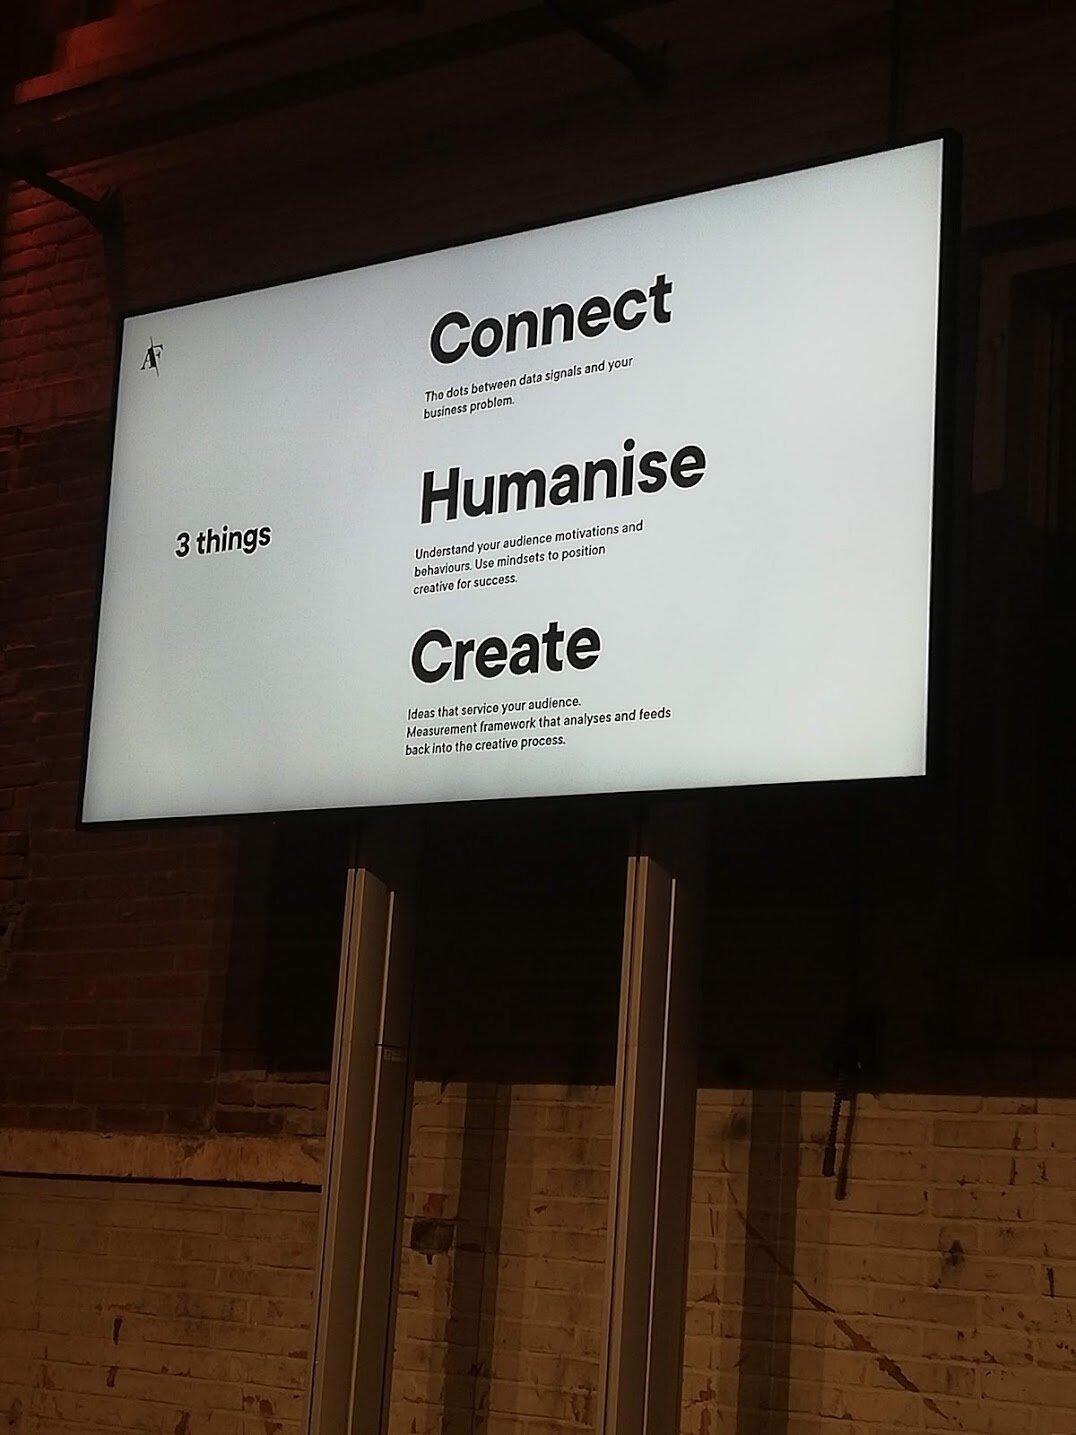 Another interesting slide by Analog folk